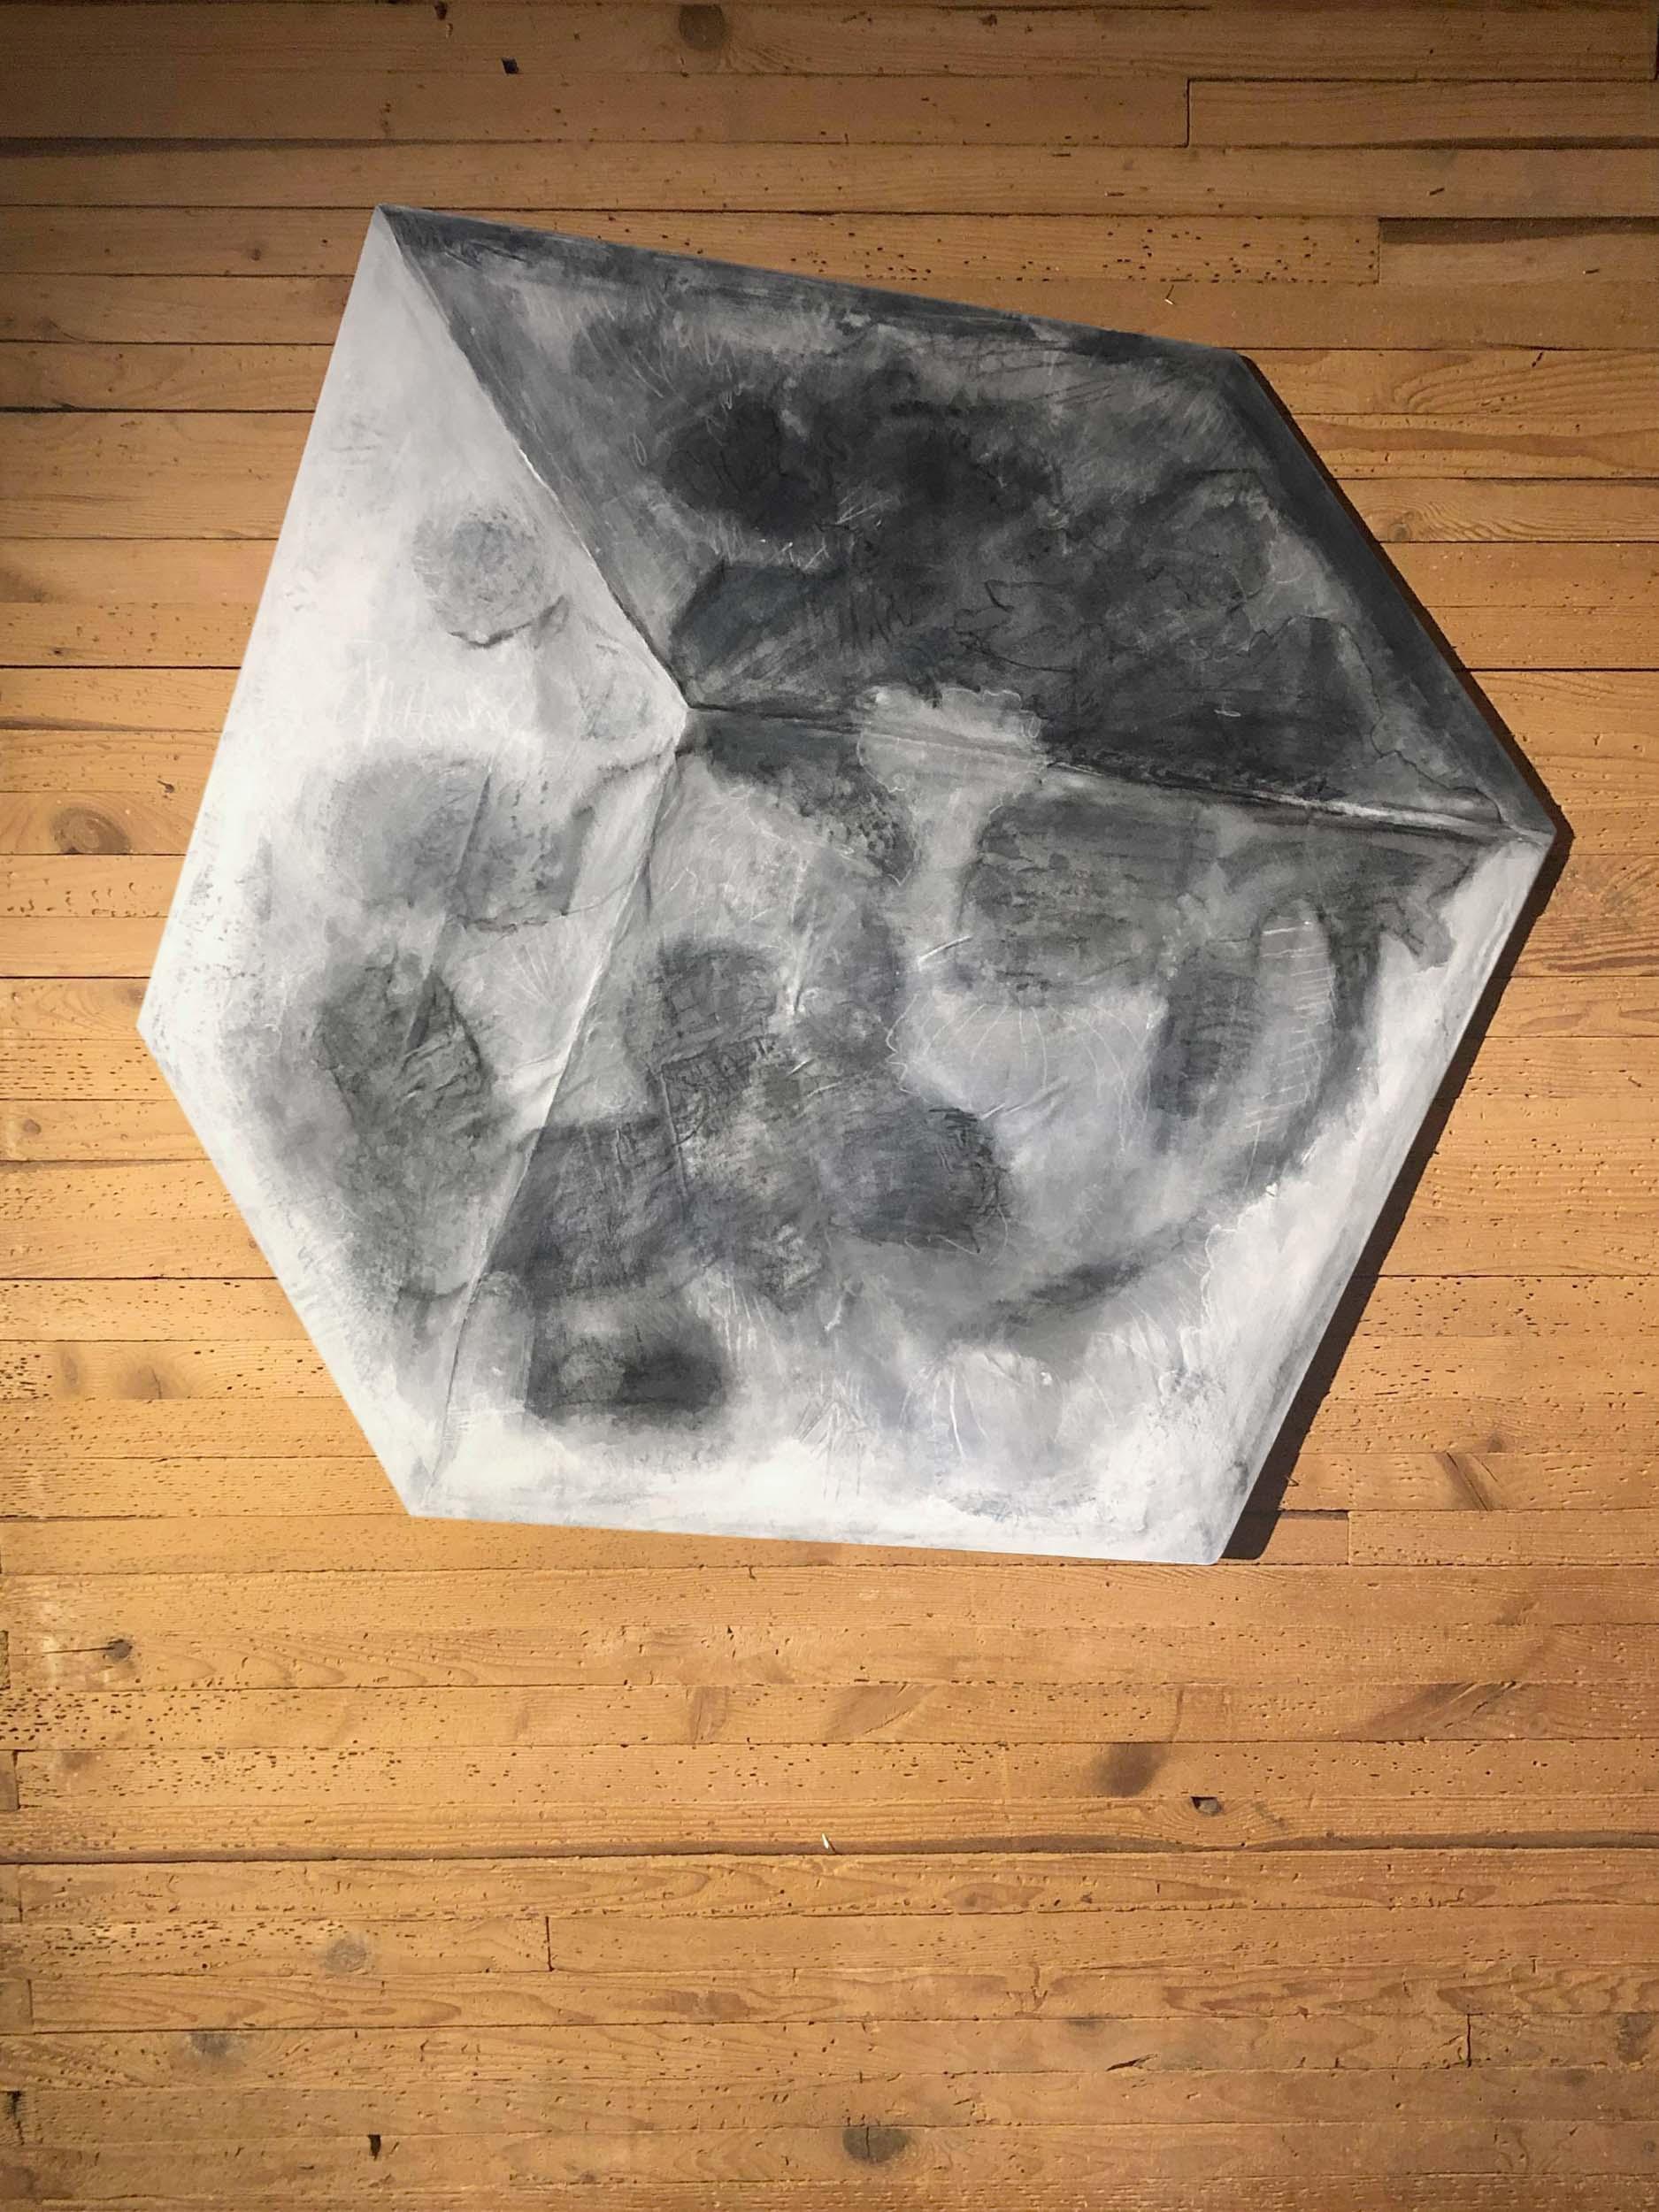 wassaic-project-artist-daniel-zeese-cube-moon-2019-01-06-20-43-15.jpg